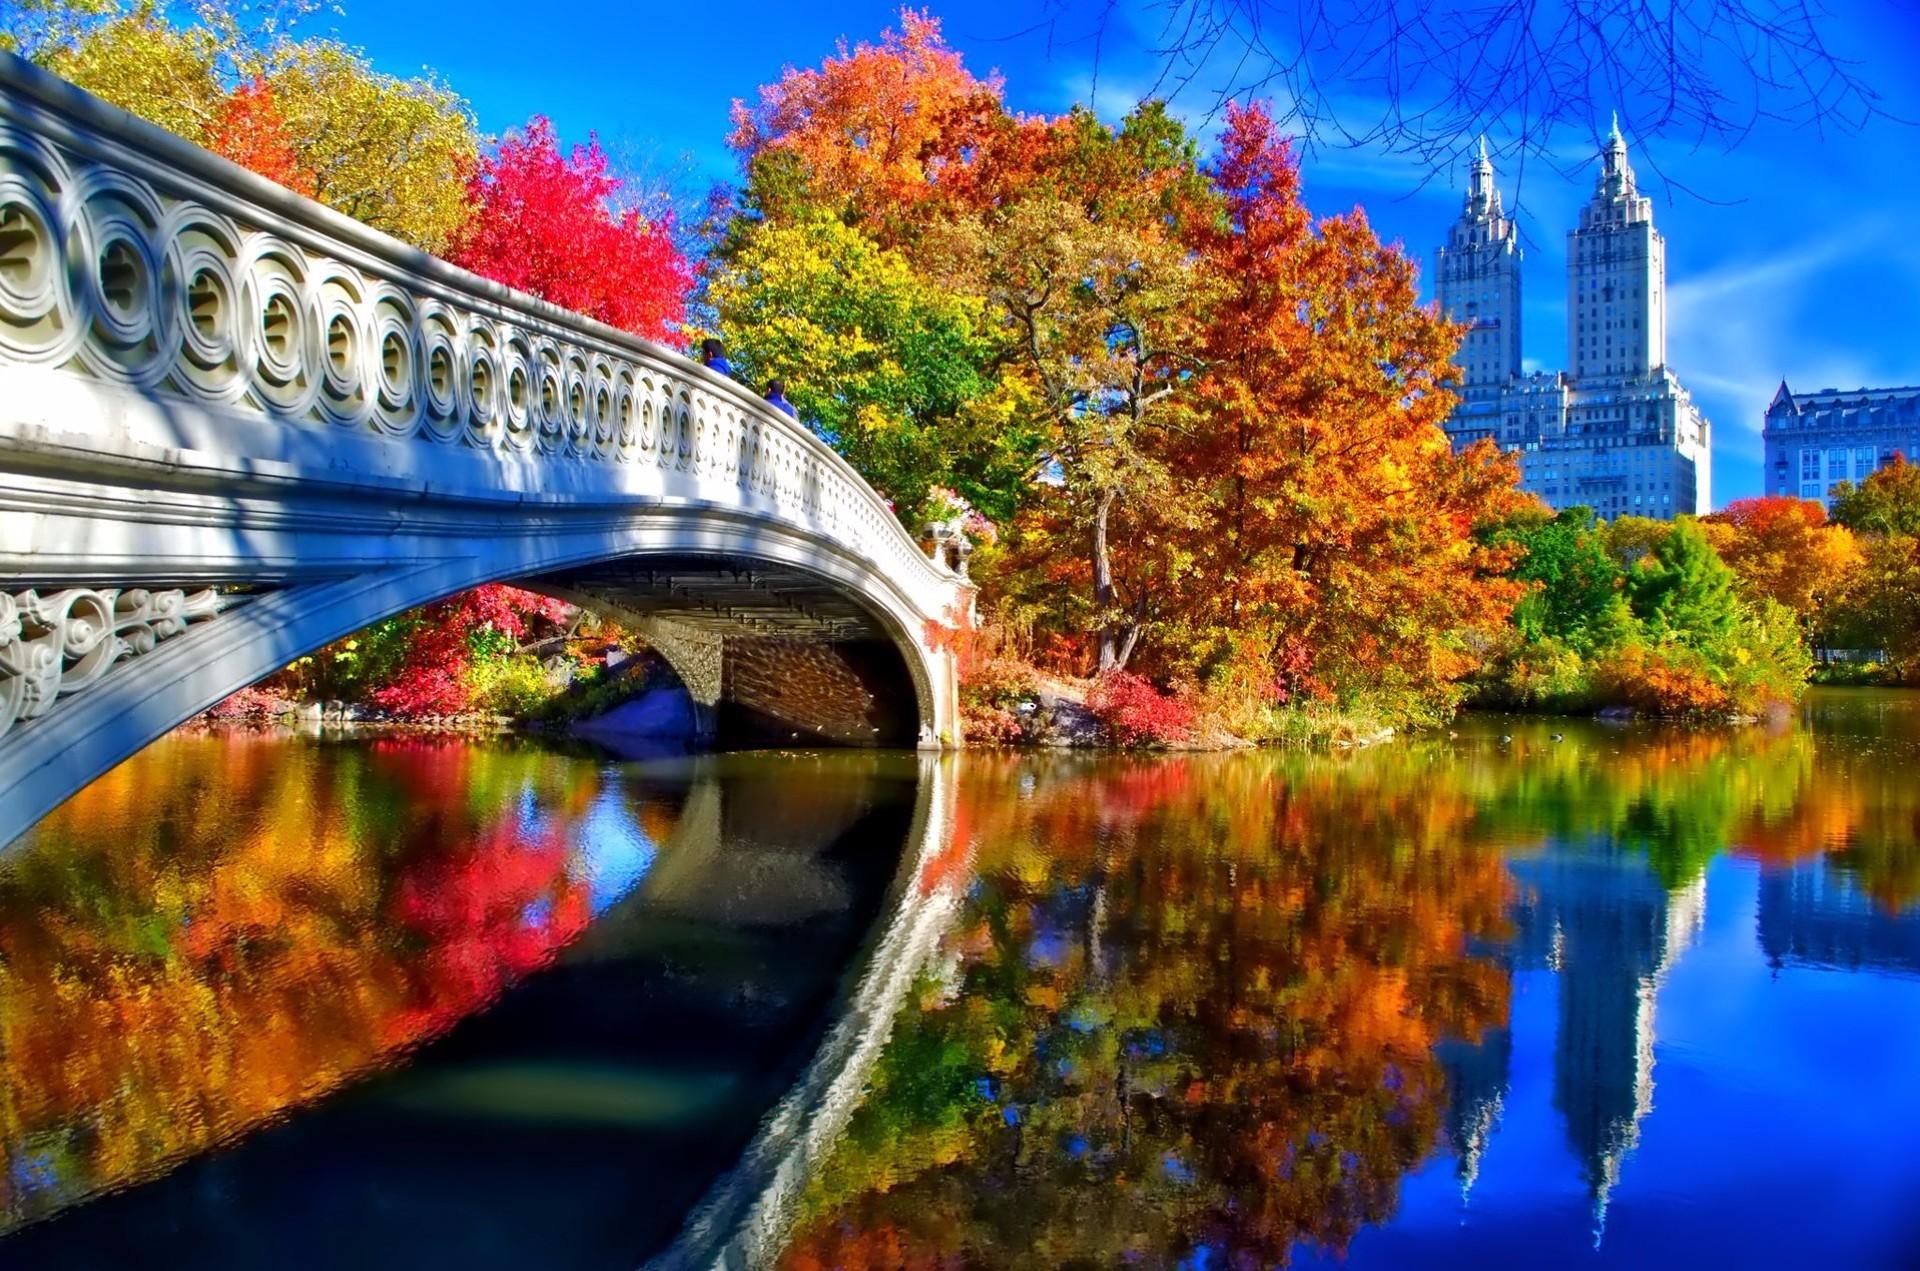 Man Made – Bridge Man Made Central Park New York Fall Foliage Tree Building  Reflection Wallpaper